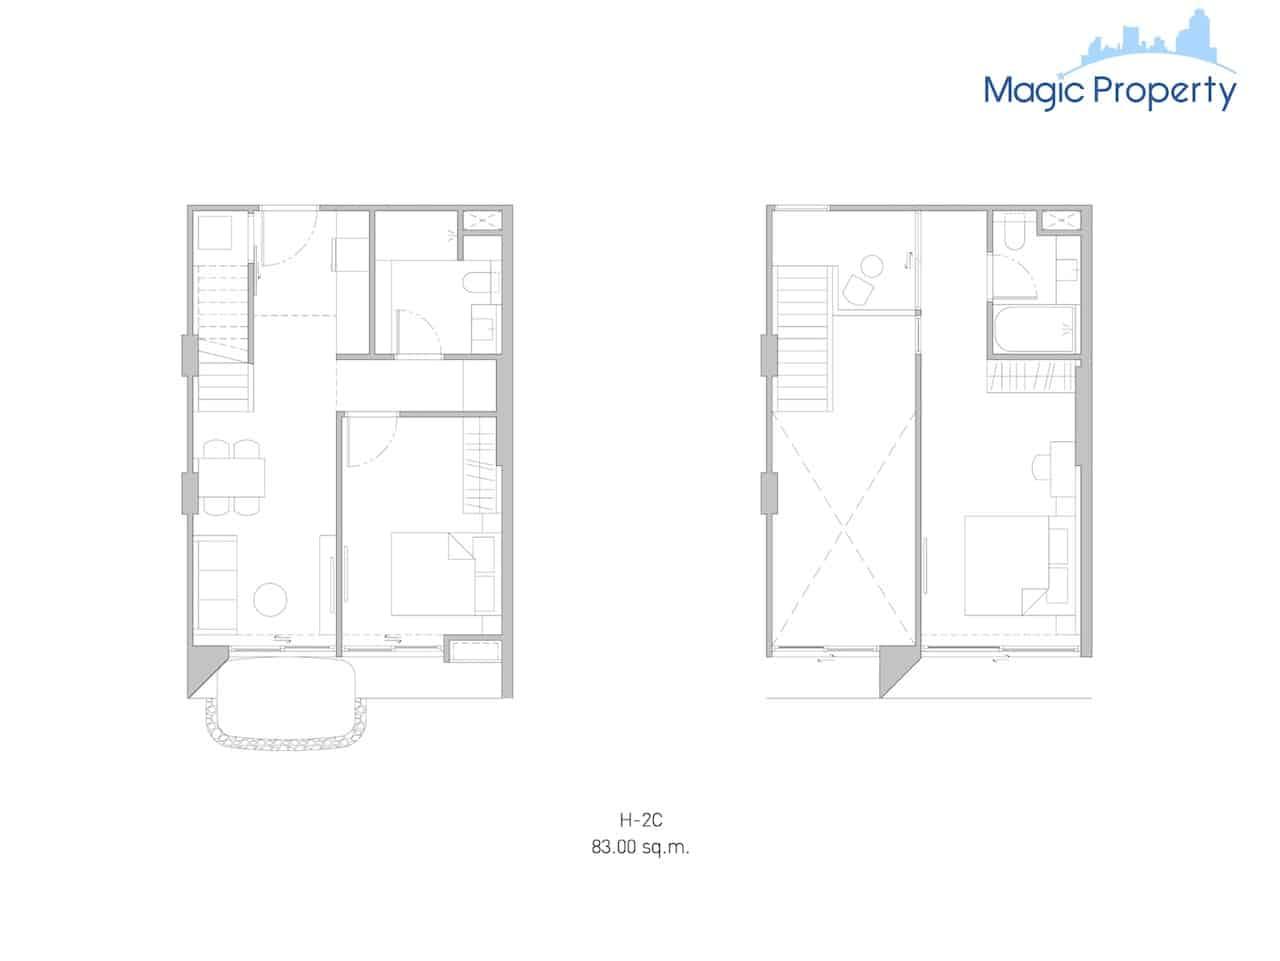 Duplex(H-2c-2-Size-83-Sqm.)